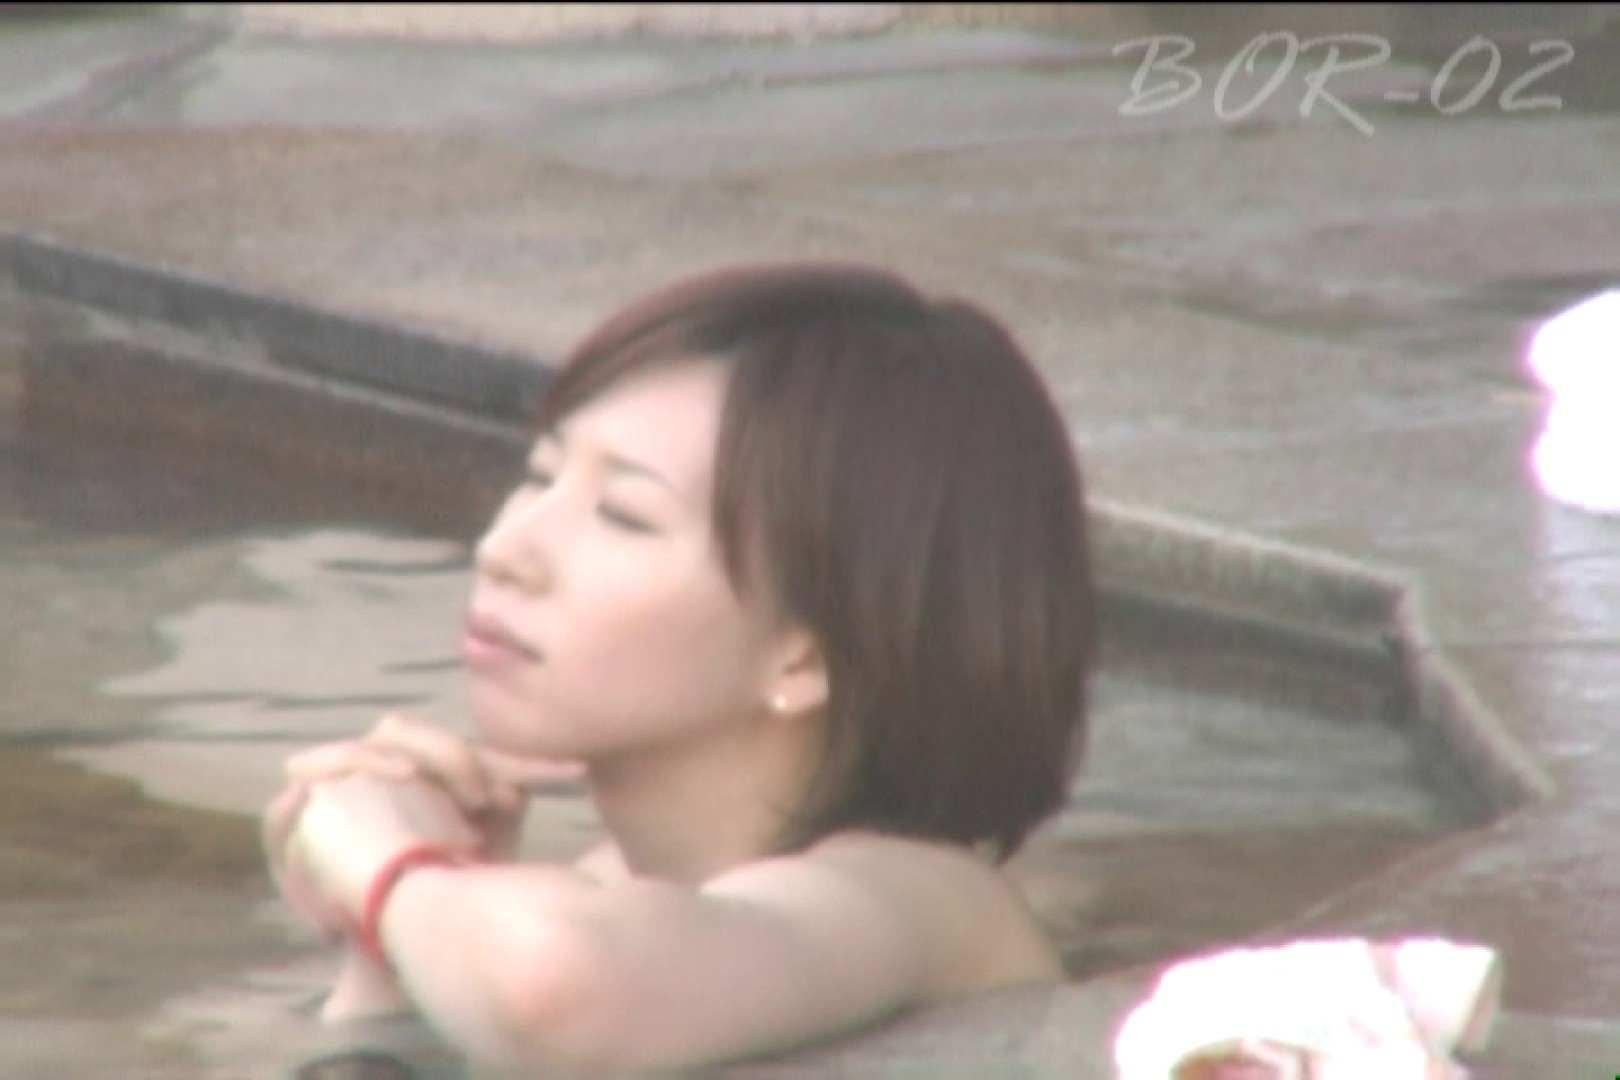 Aquaな露天風呂Vol.476 盗撮 濡れ場動画紹介 80画像 32